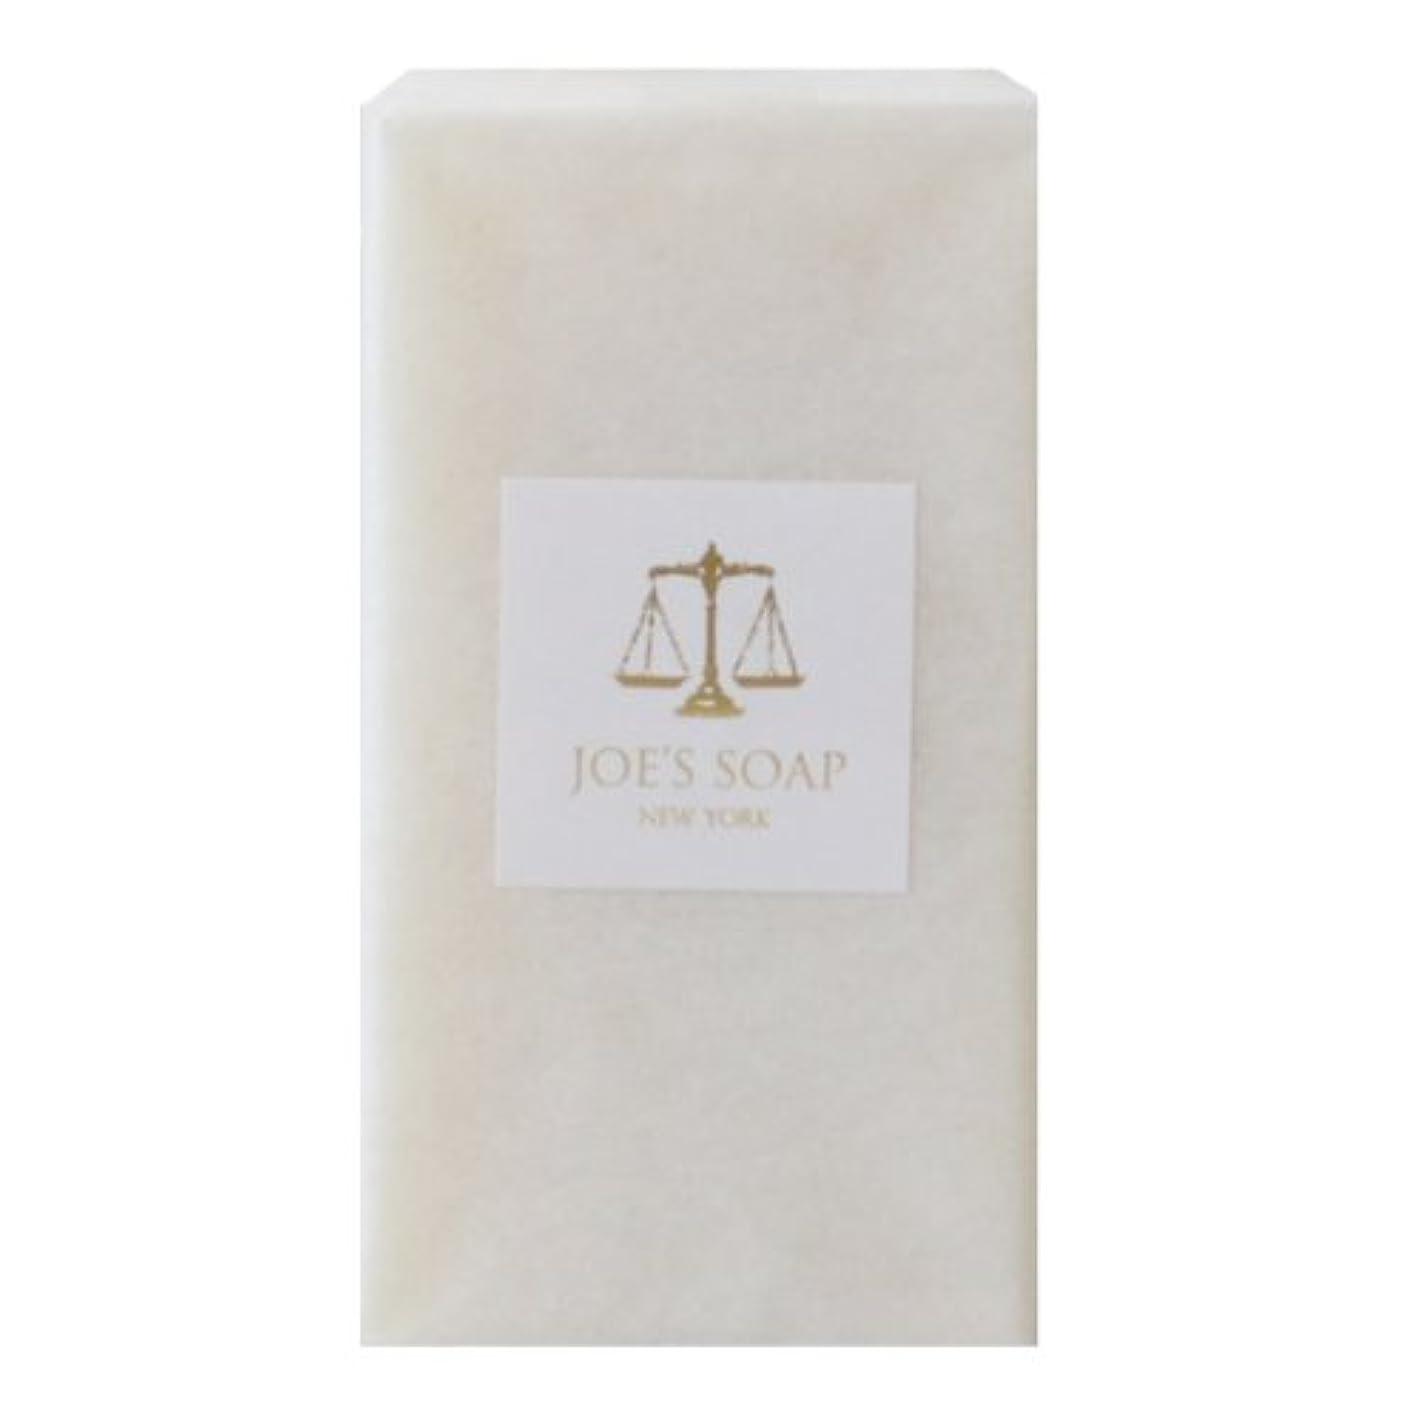 JOE'S SOAP ジョーズソープ オリーブソープ NO.1 100g 石鹸 無香料 無添加 オーガニックソープ 洗顔料 オリーブ石けん せっけん 固形 定形外郵便